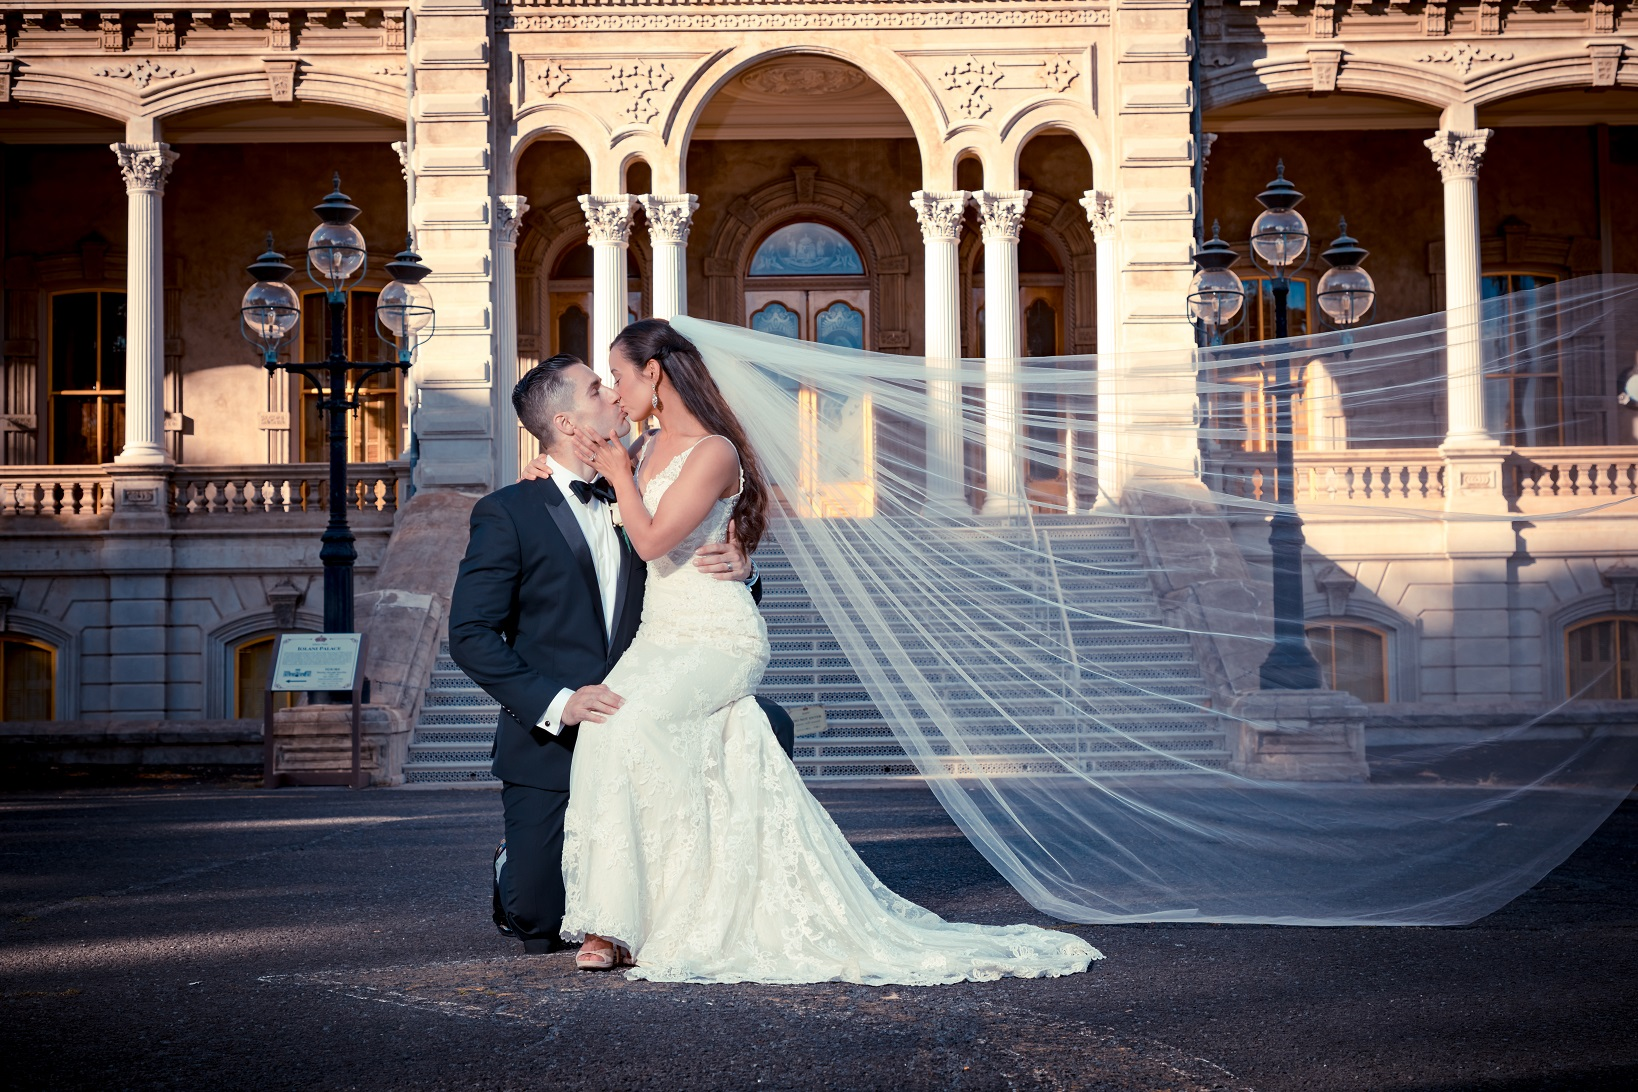 wedding kiss portrait photography oahu hawaii